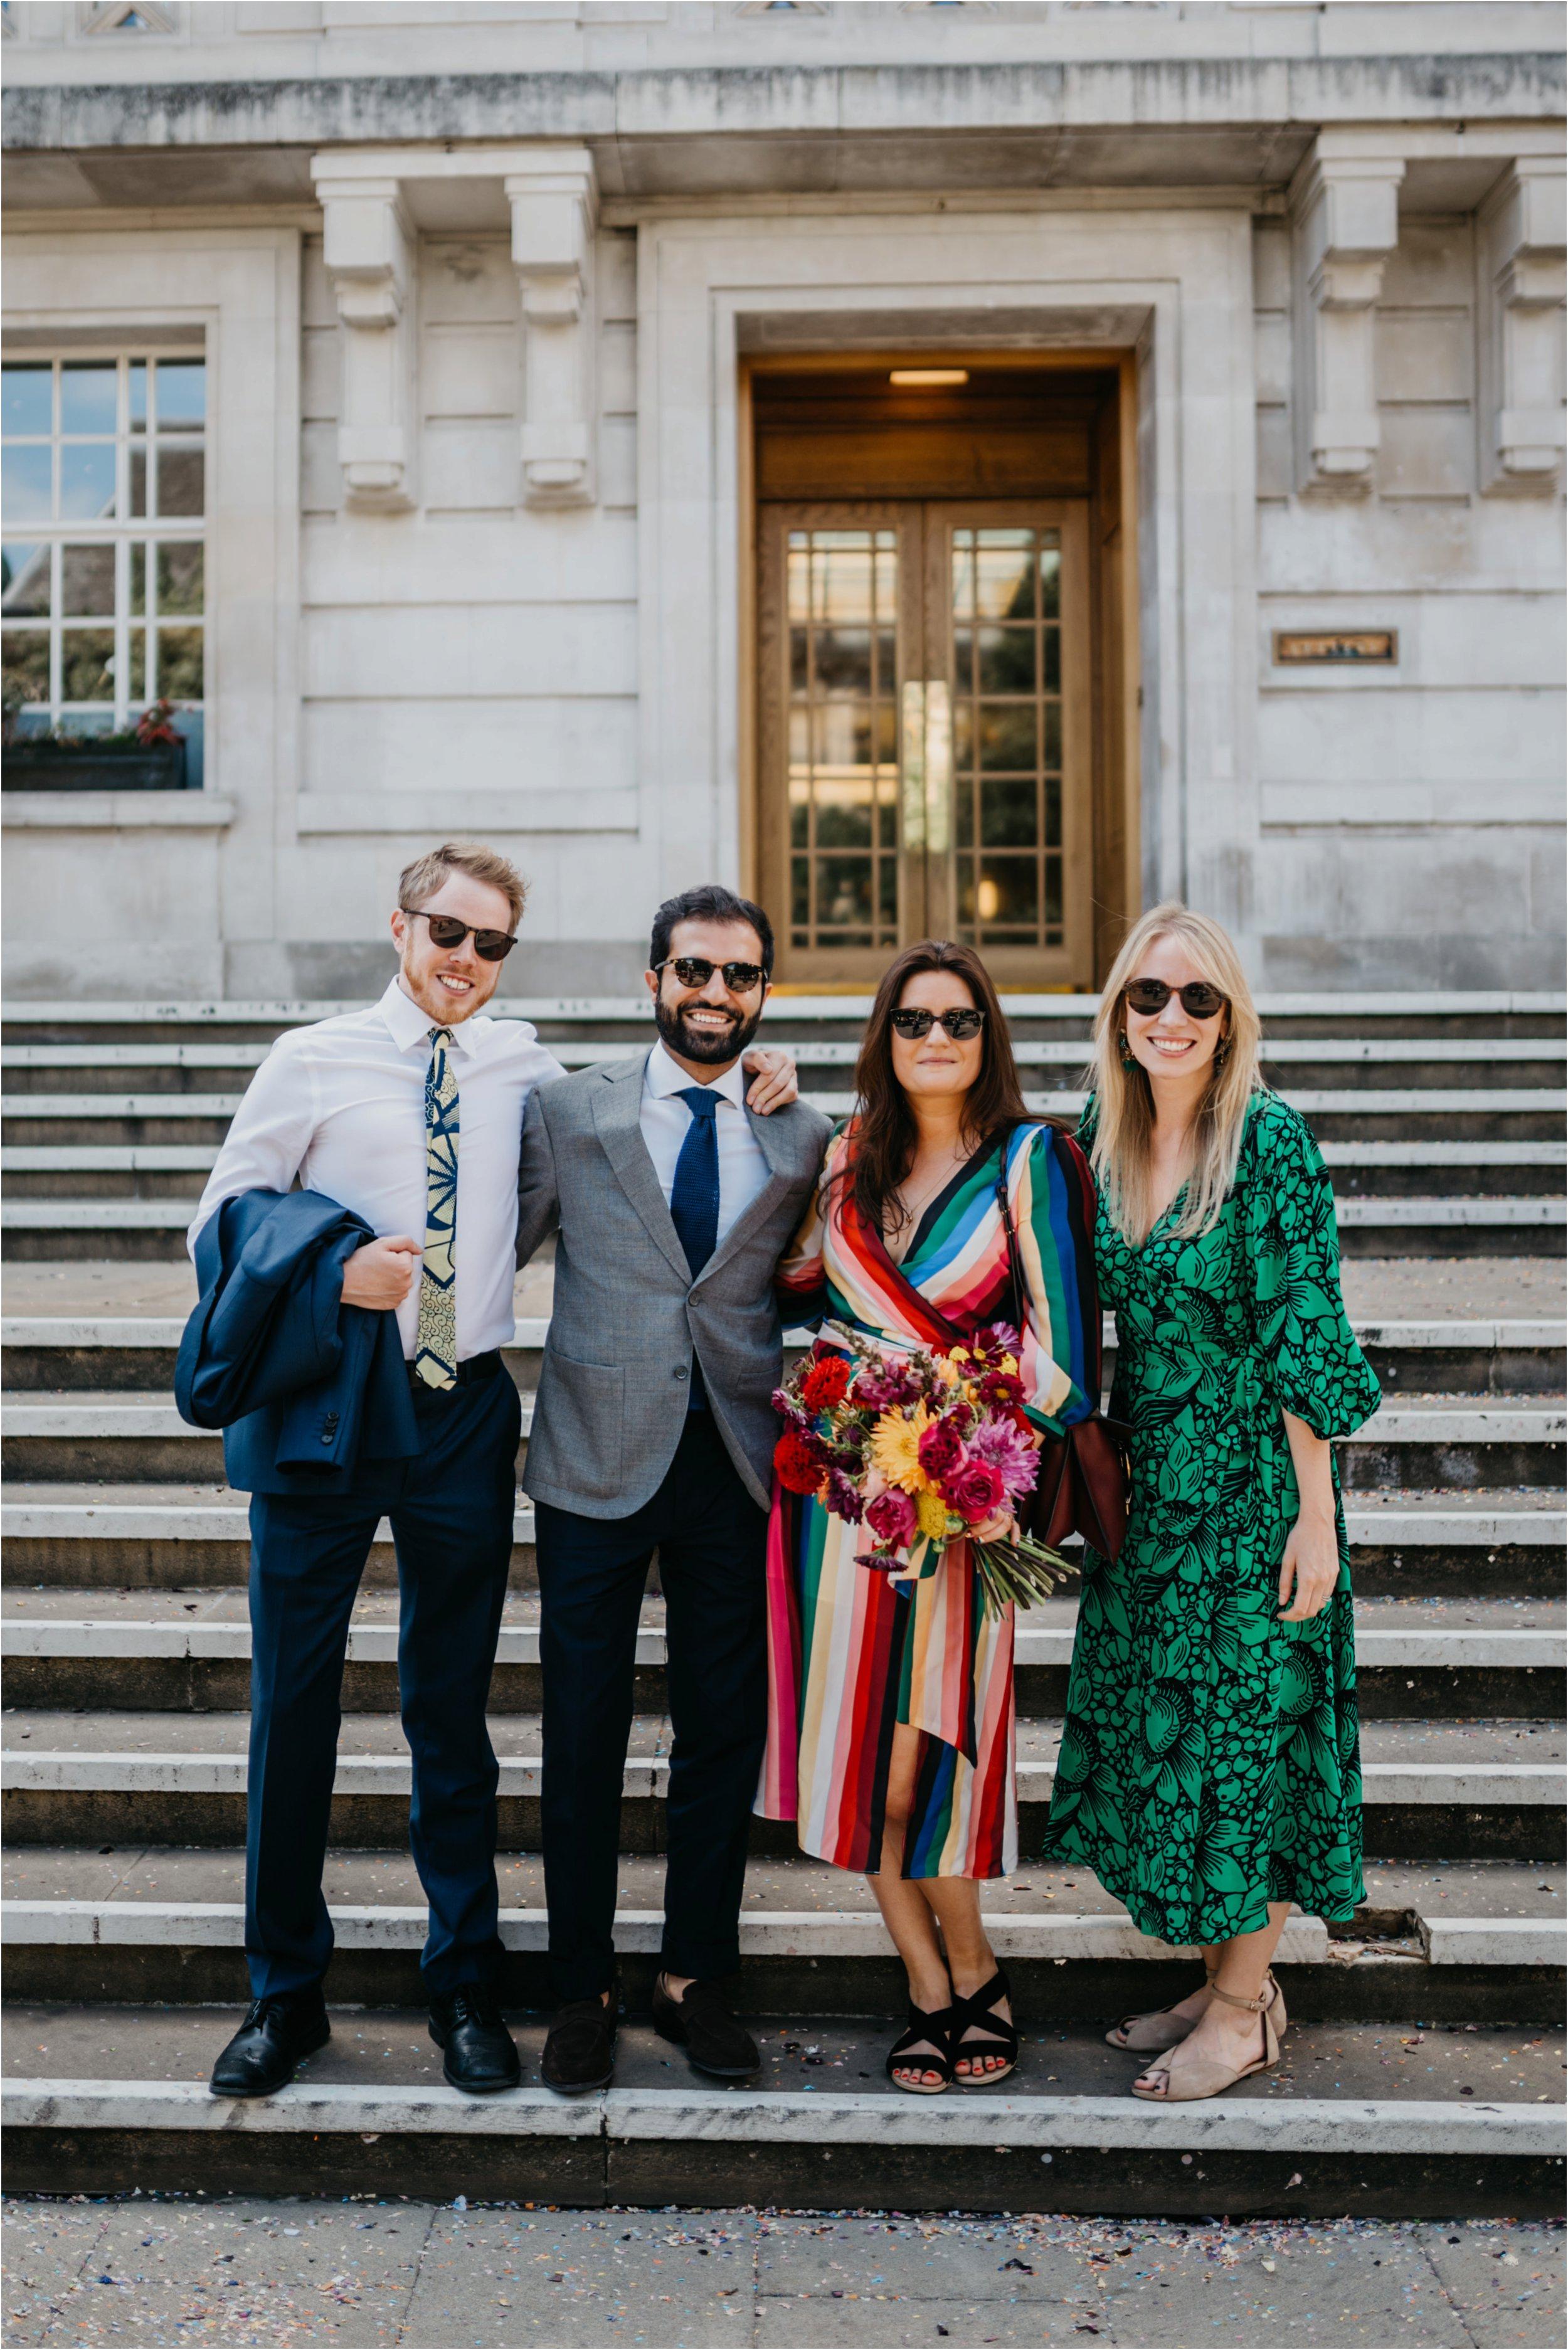 Hackney Town Hall London wedding photographer_0016.jpg